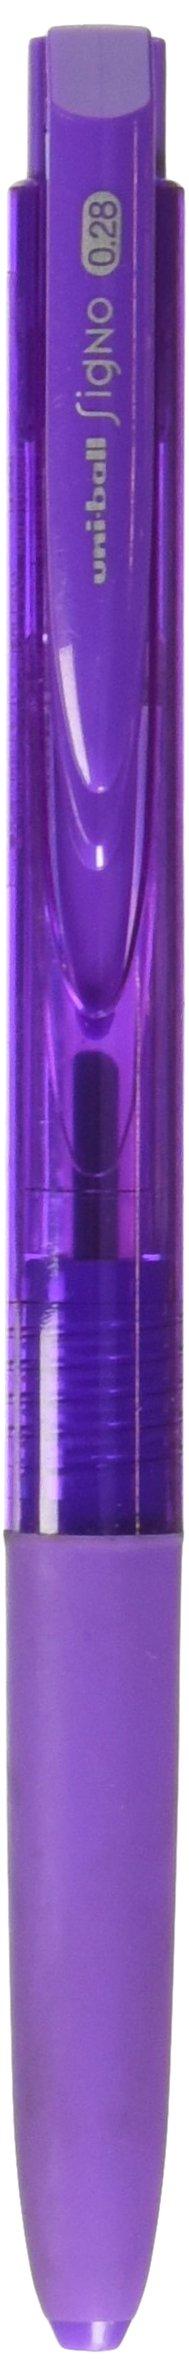 Uni Uni-Ball Signo Knock Ballpoint Pen RT1 0.28mm Color,...